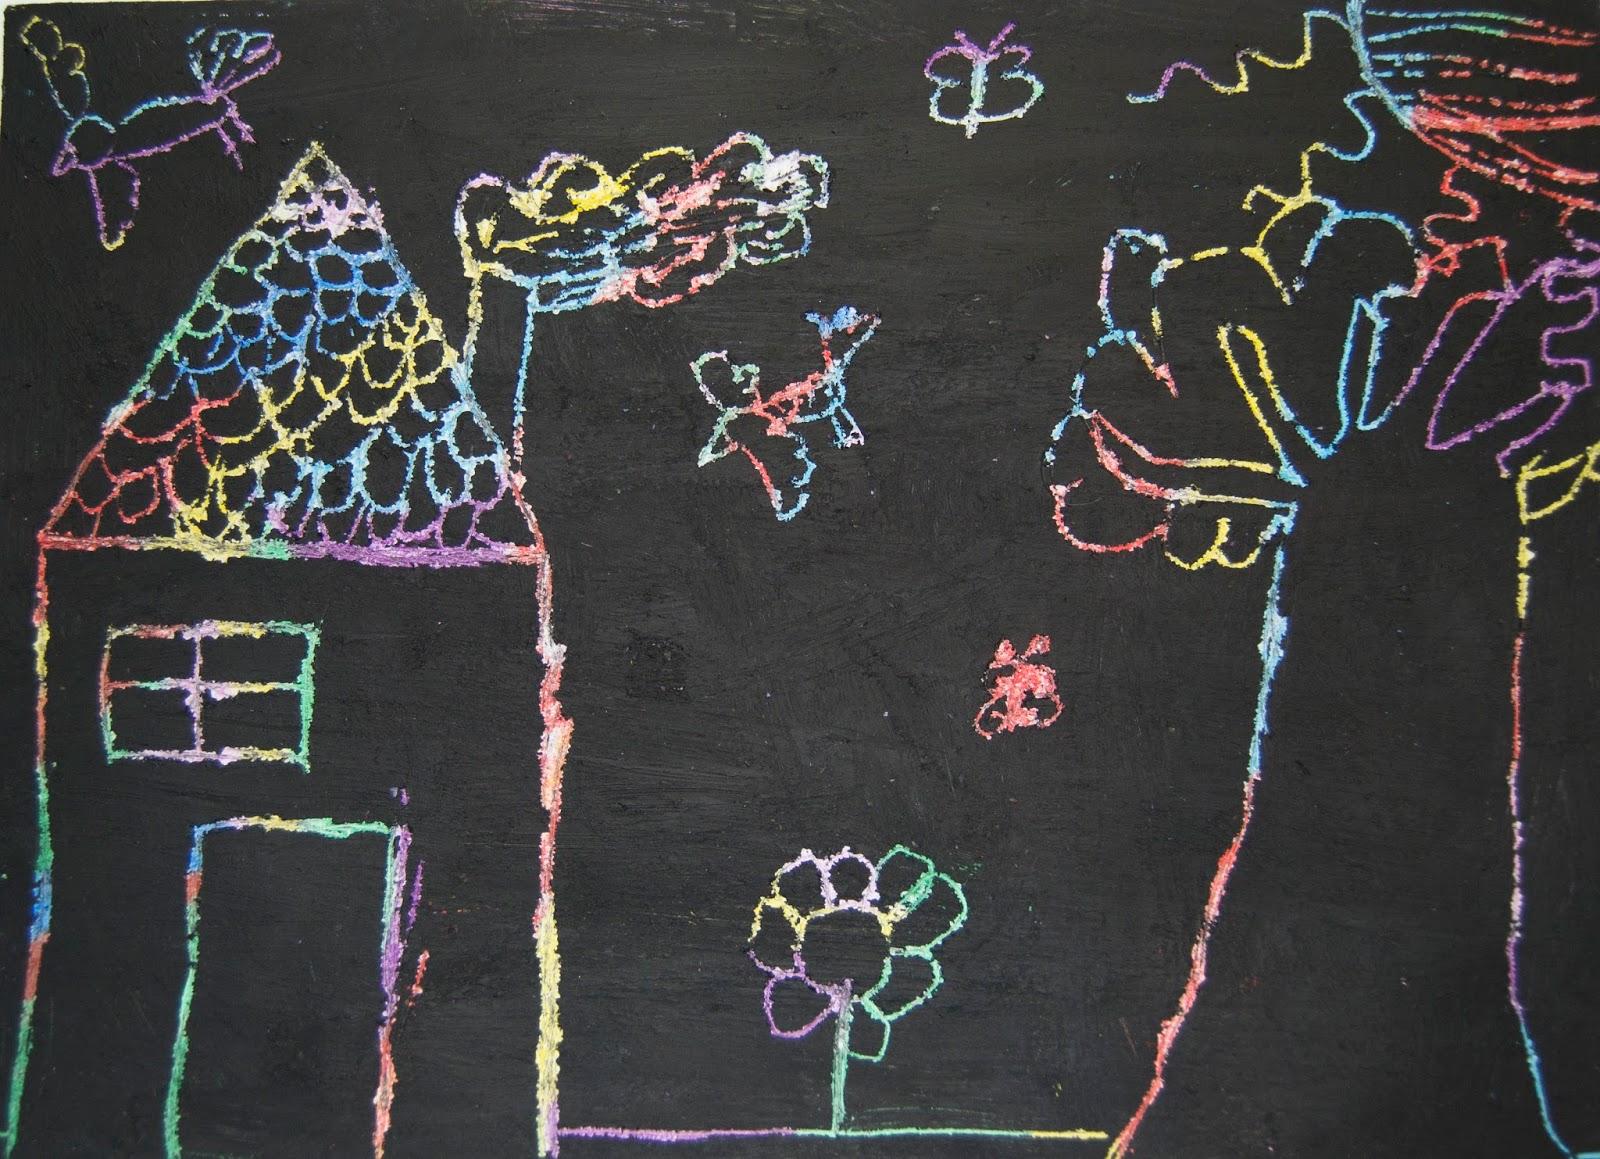 Original Libreta Mágica Para Raspar Dibujar Y Escribir: Días De Inspiración: Manualidades Para Niños